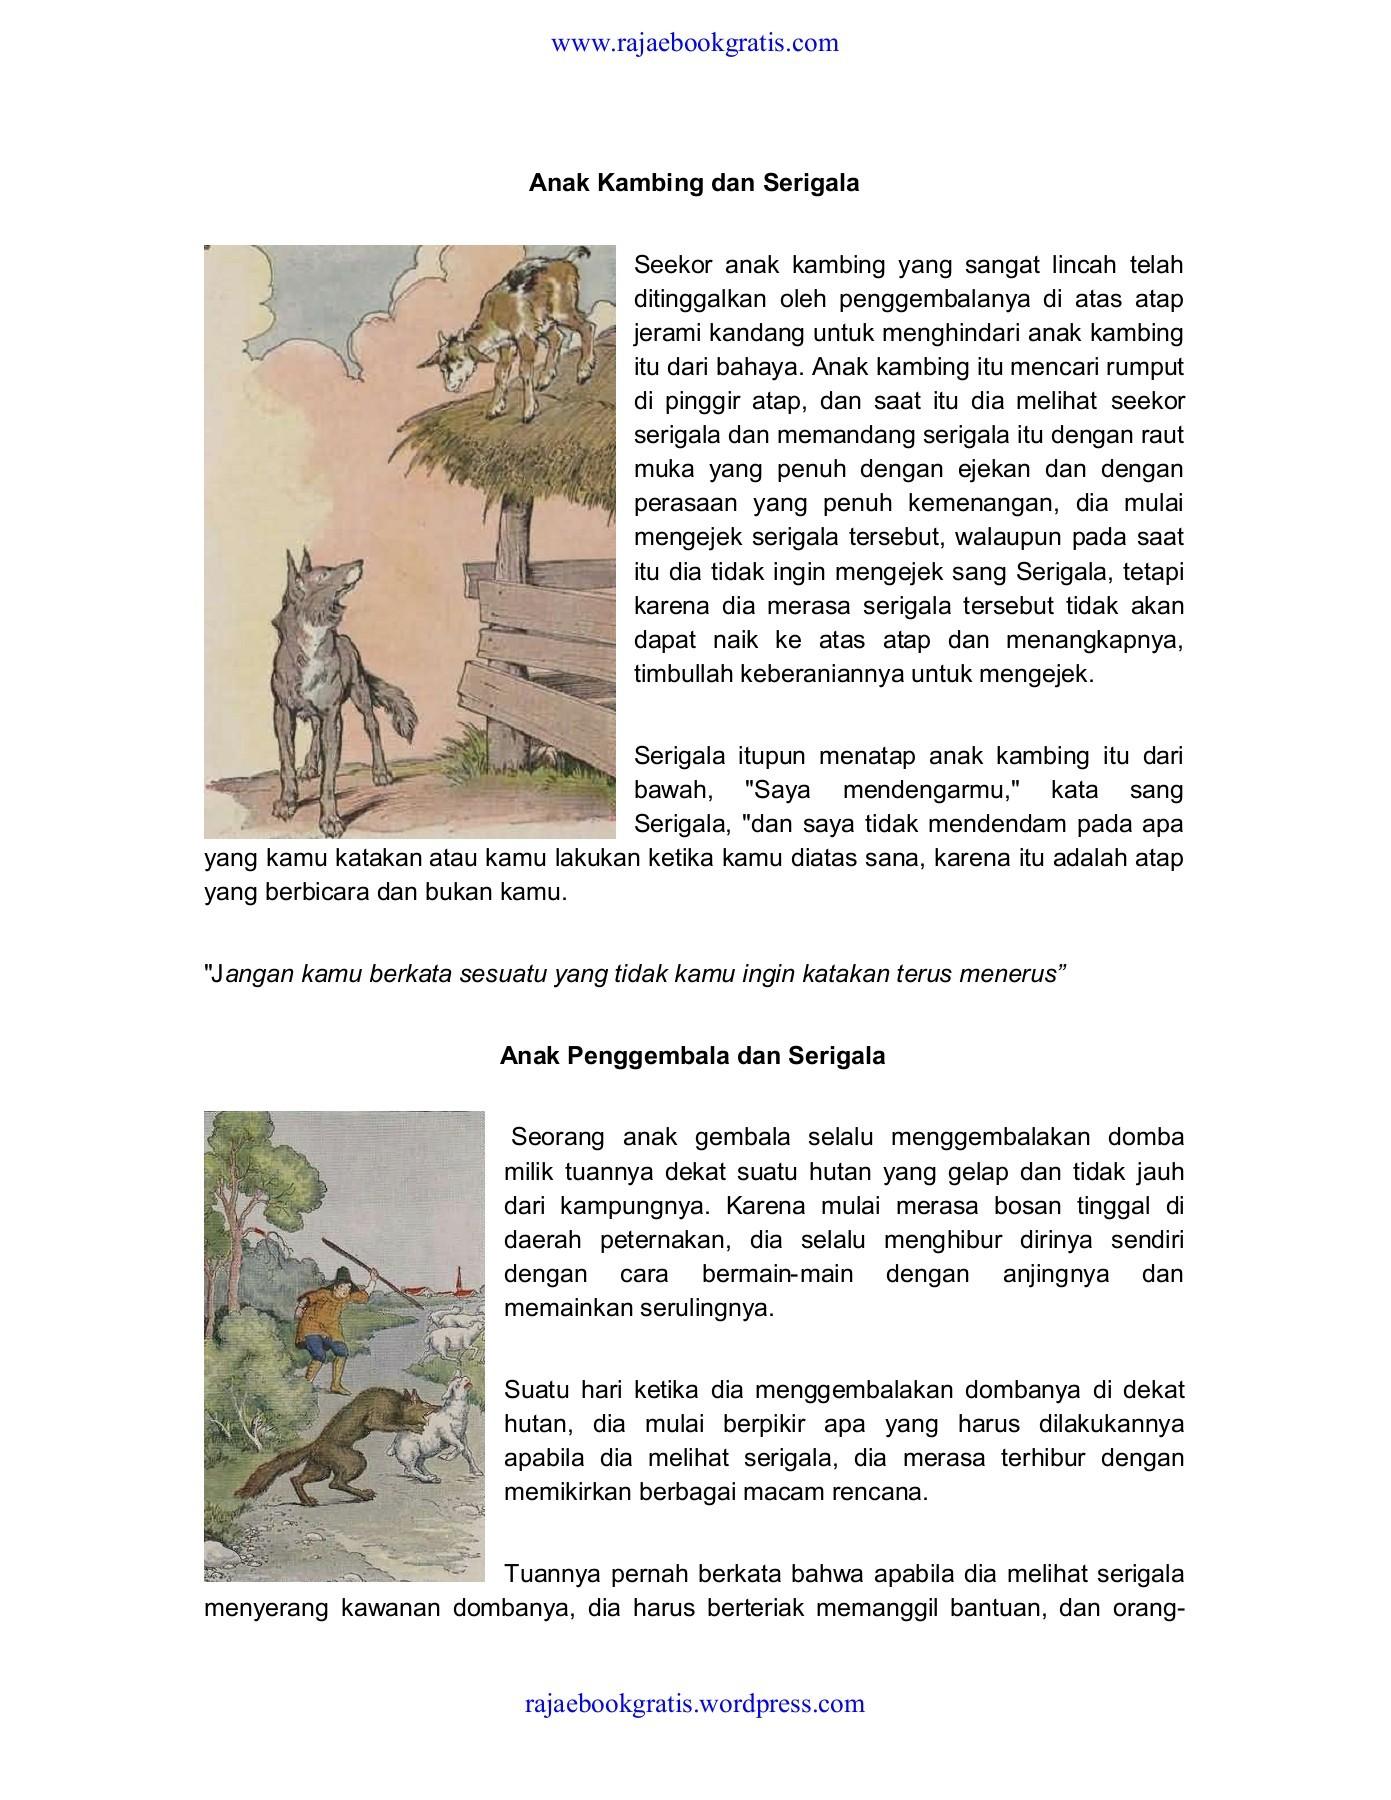 Cerita Dongeng Fabel : cerita, dongeng, fabel, Dongeng, Fabel